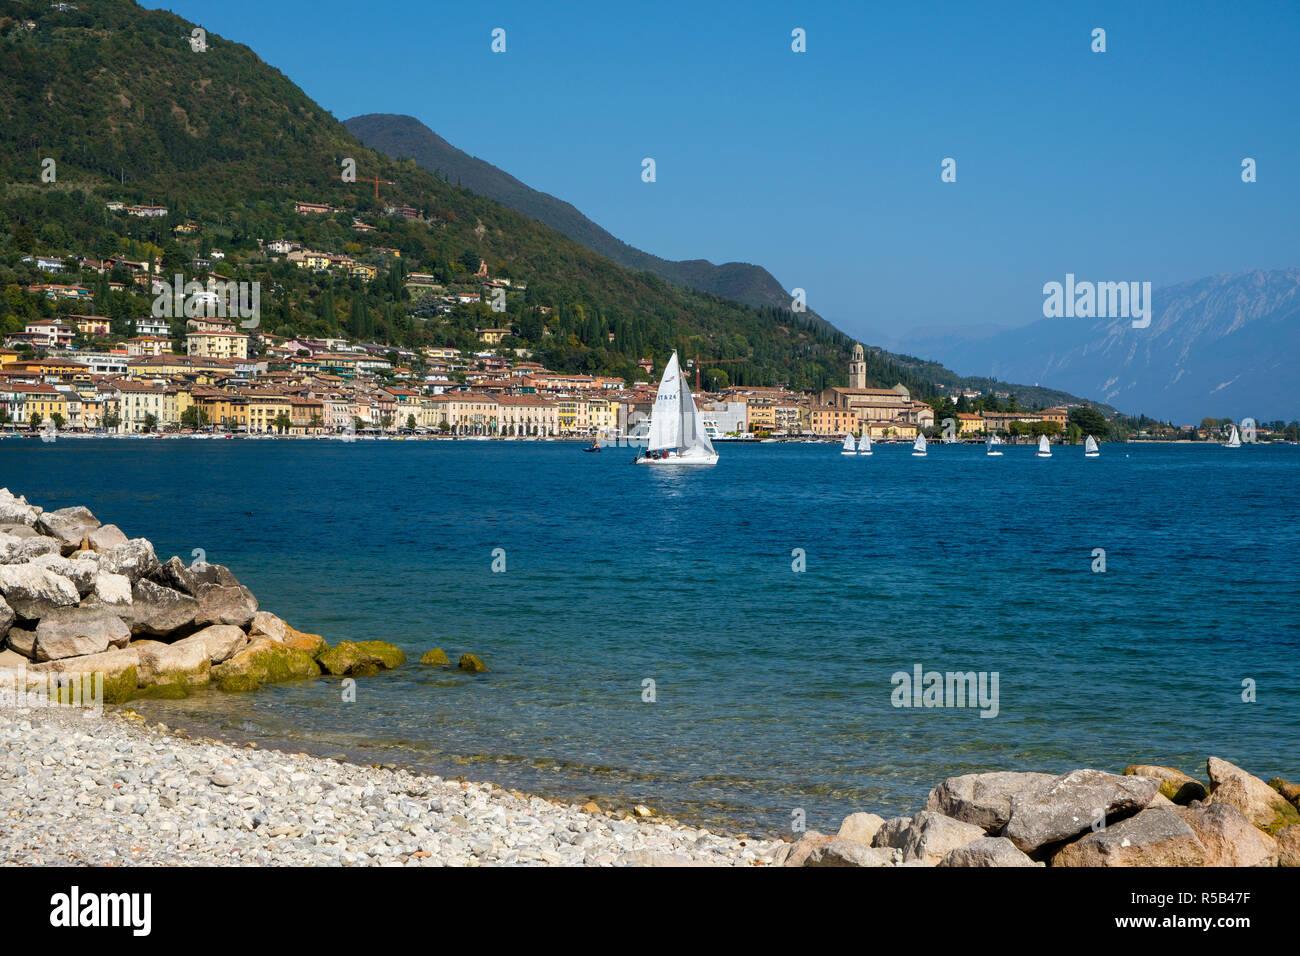 Salò, Lago de Garda, provincia de Brescia, Lombardía, Italia Foto de stock